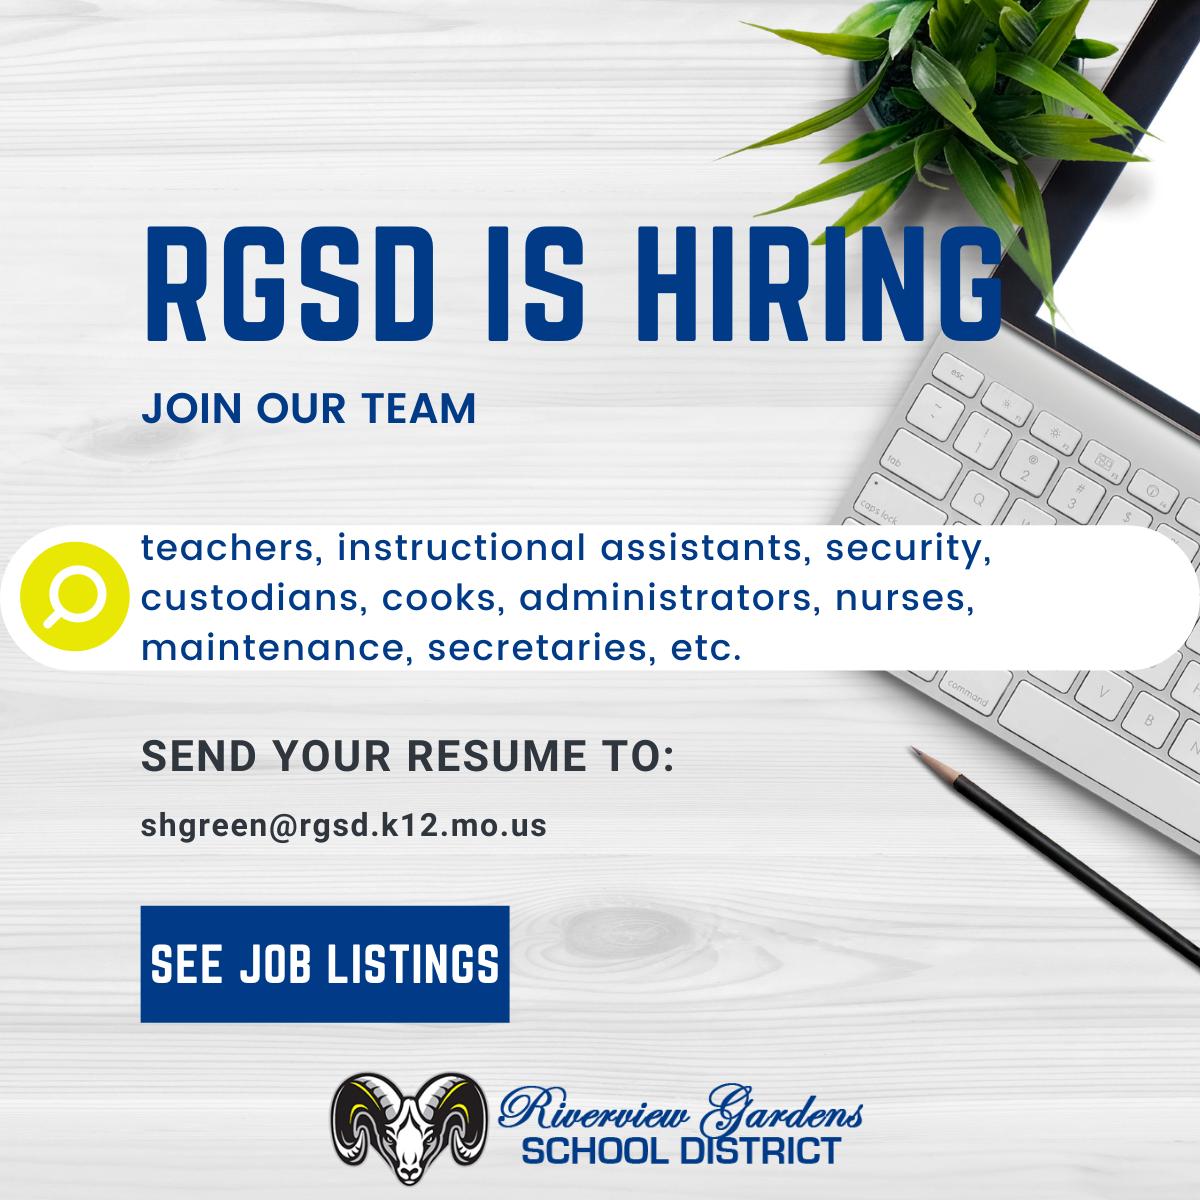 RGSD is hiring